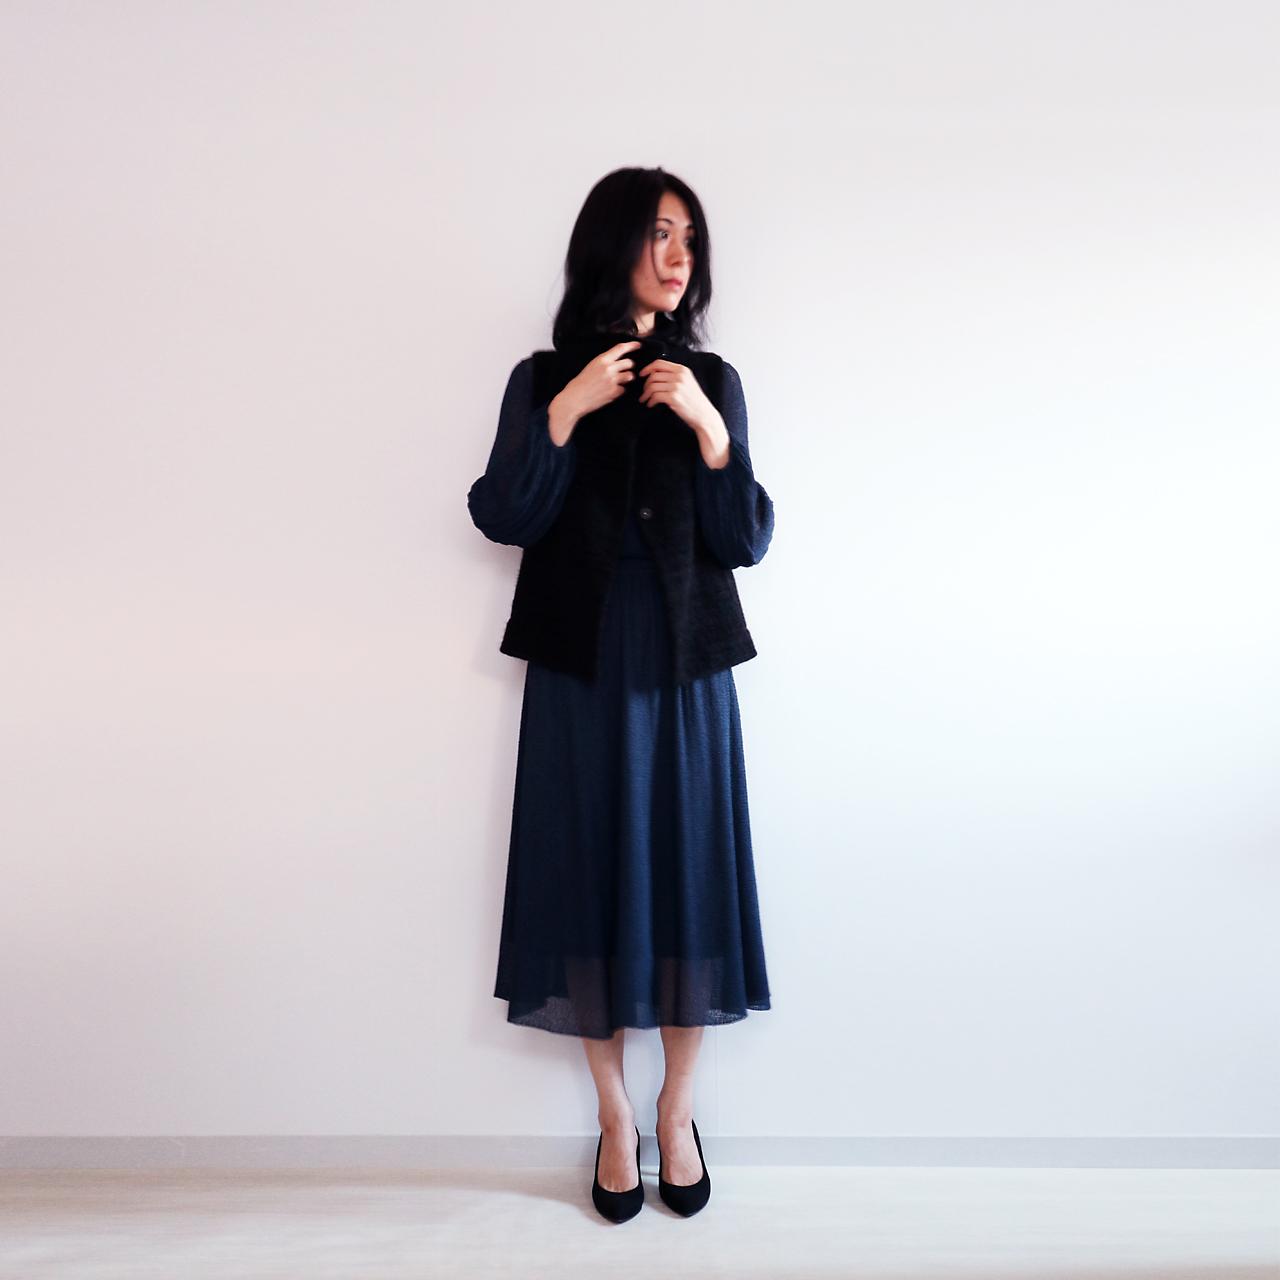 Edasich[エダシク] シルクモール・ベスト / ブラック